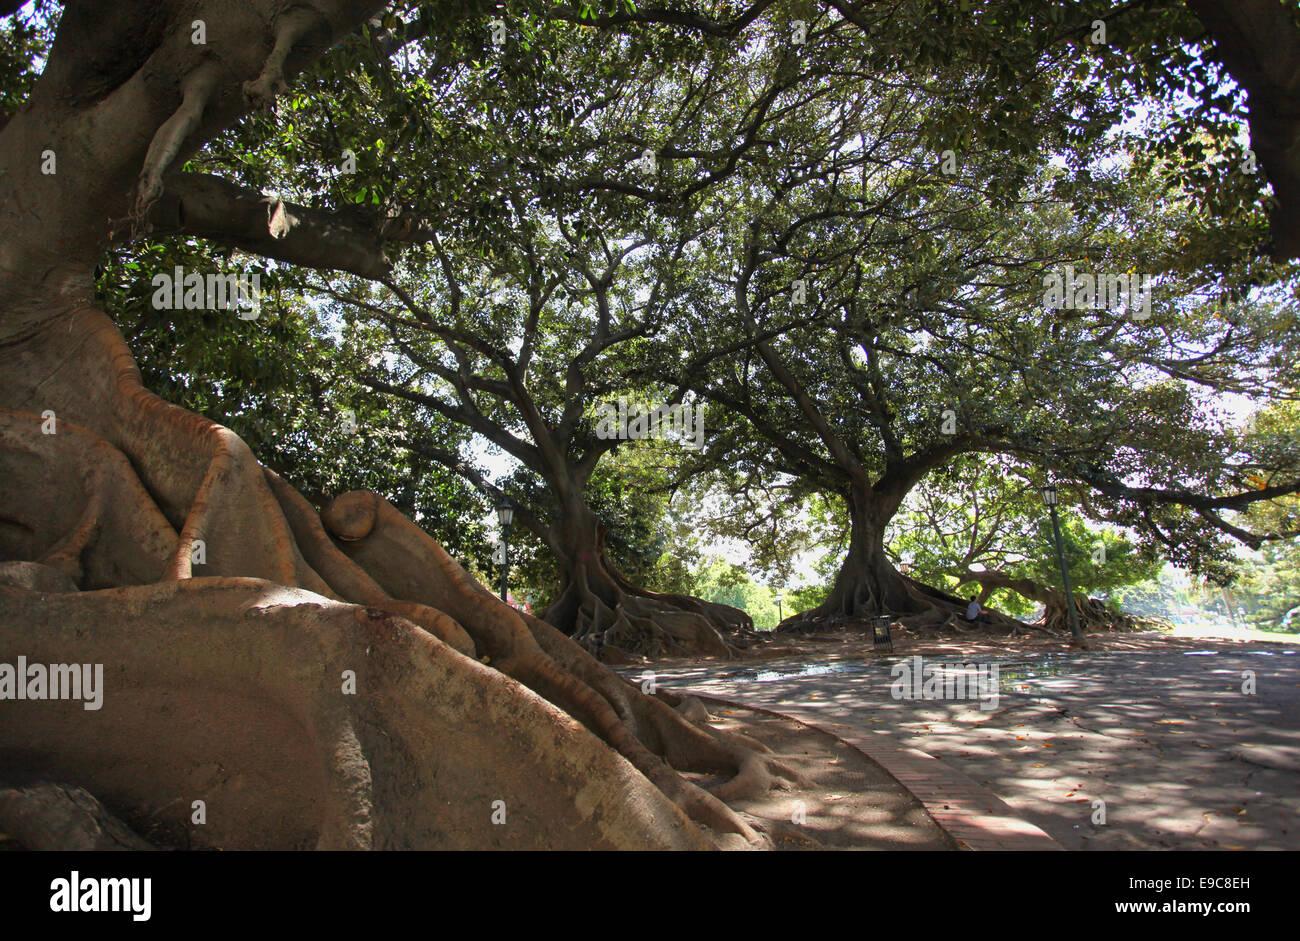 Small Banyan Tree Stock Photos & Small Banyan Tree Stock